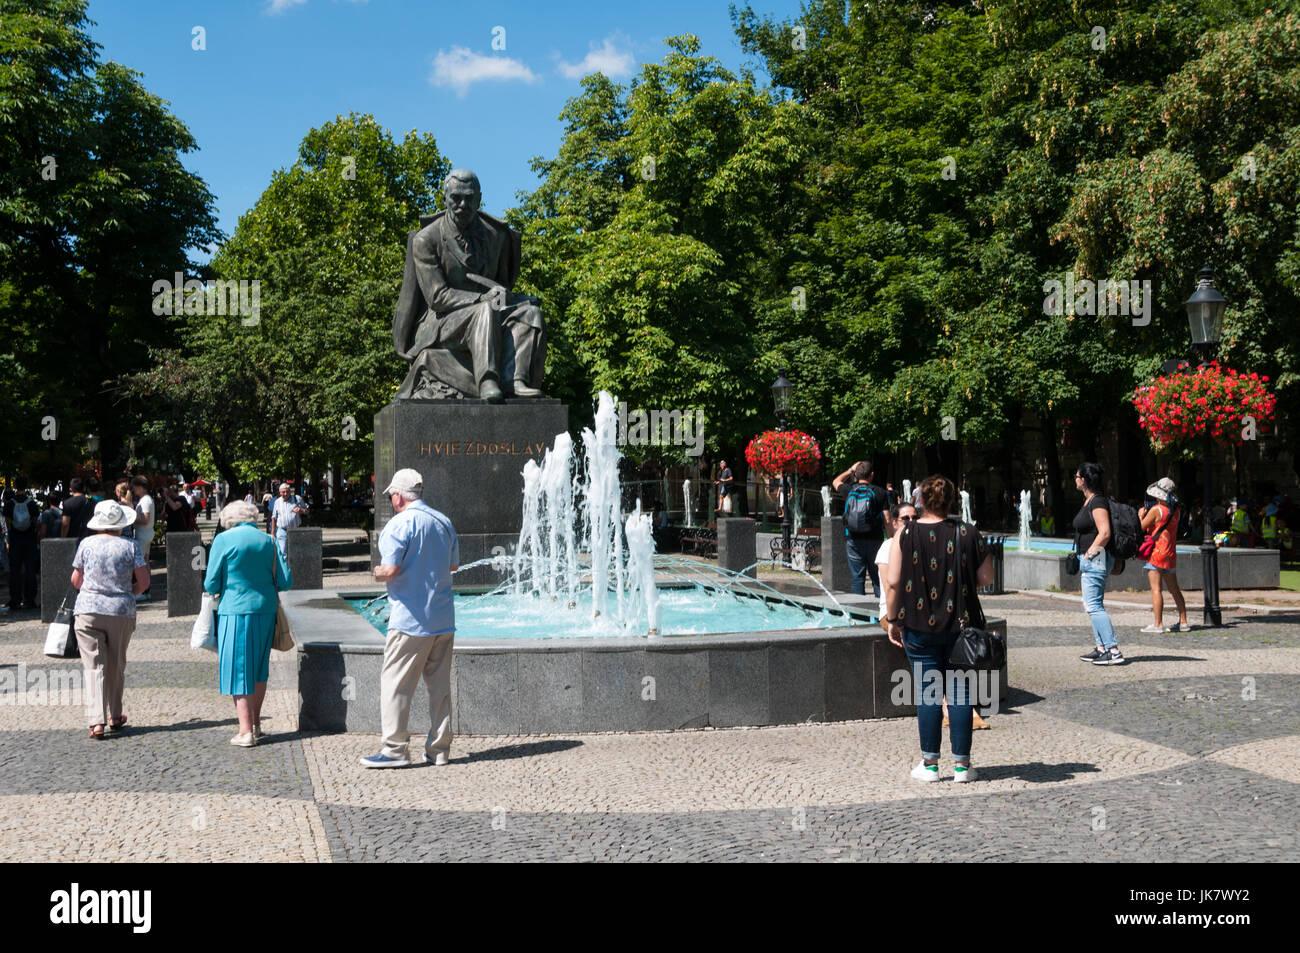 The statue of Hviezdoslav, Bratislava, Slovakia - Stock Image